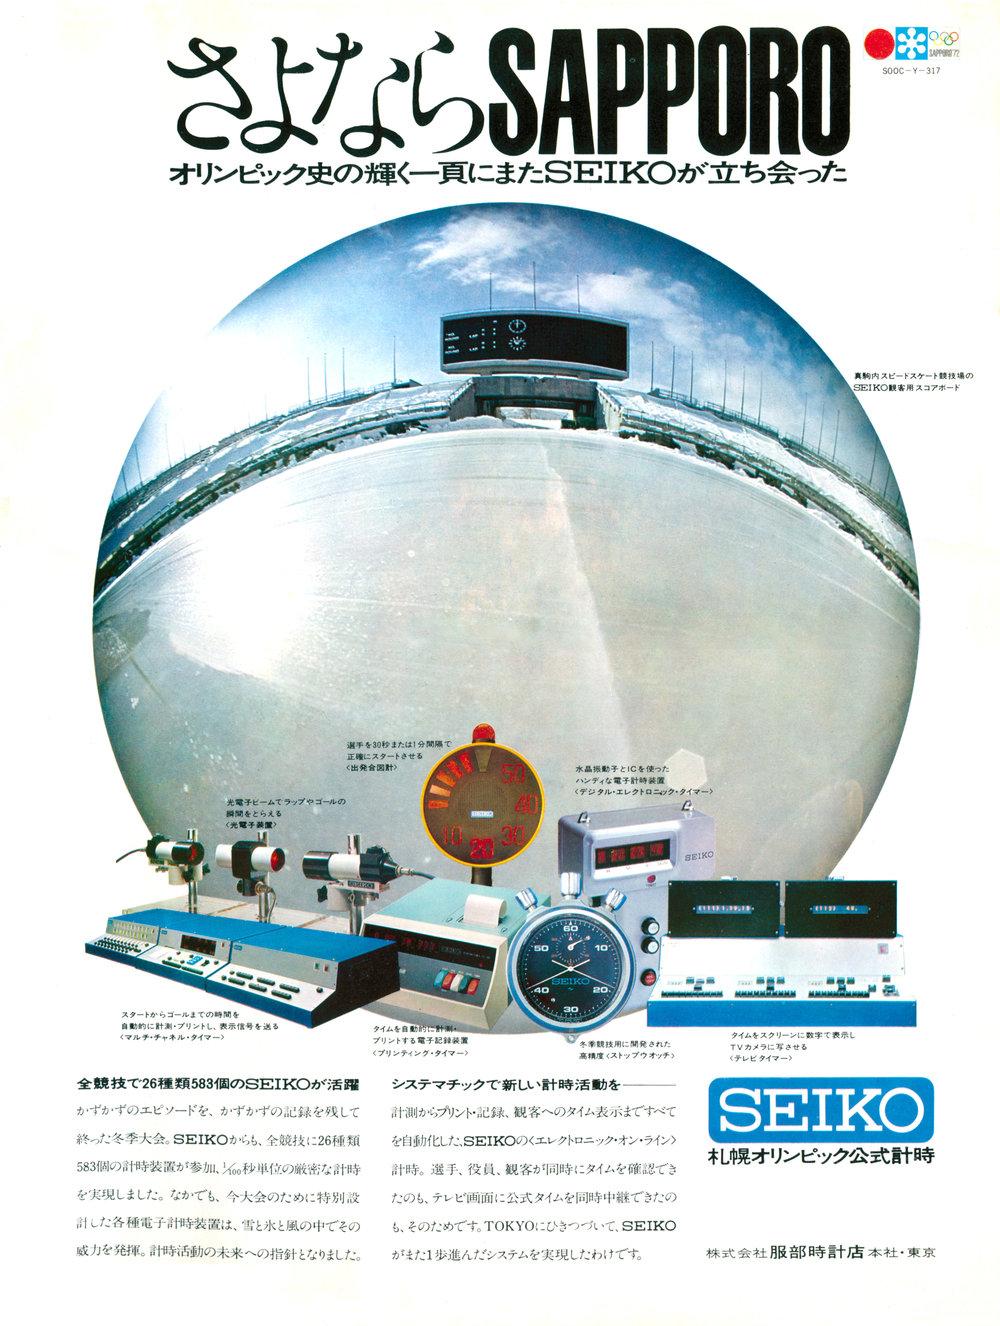 Seiko Sapporo Winter Olympics